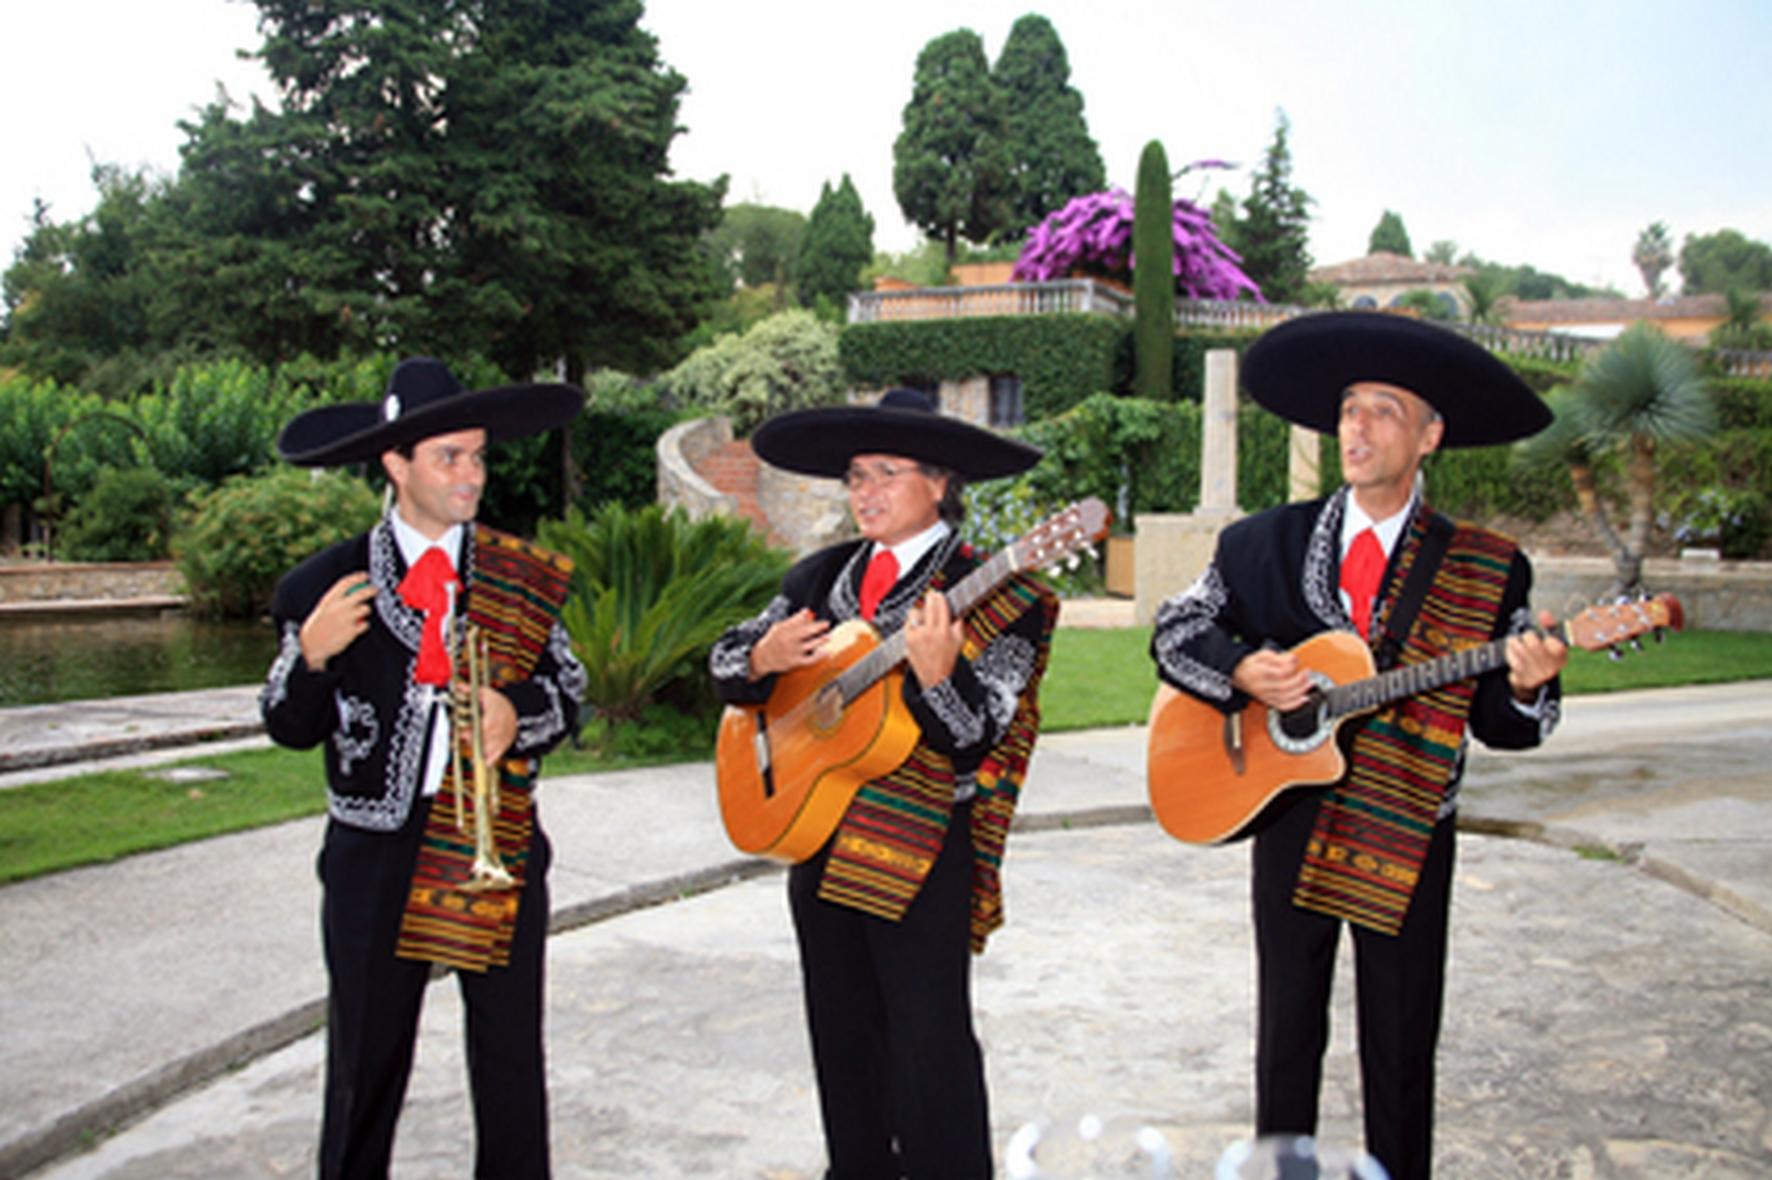 trio_mariachis_05